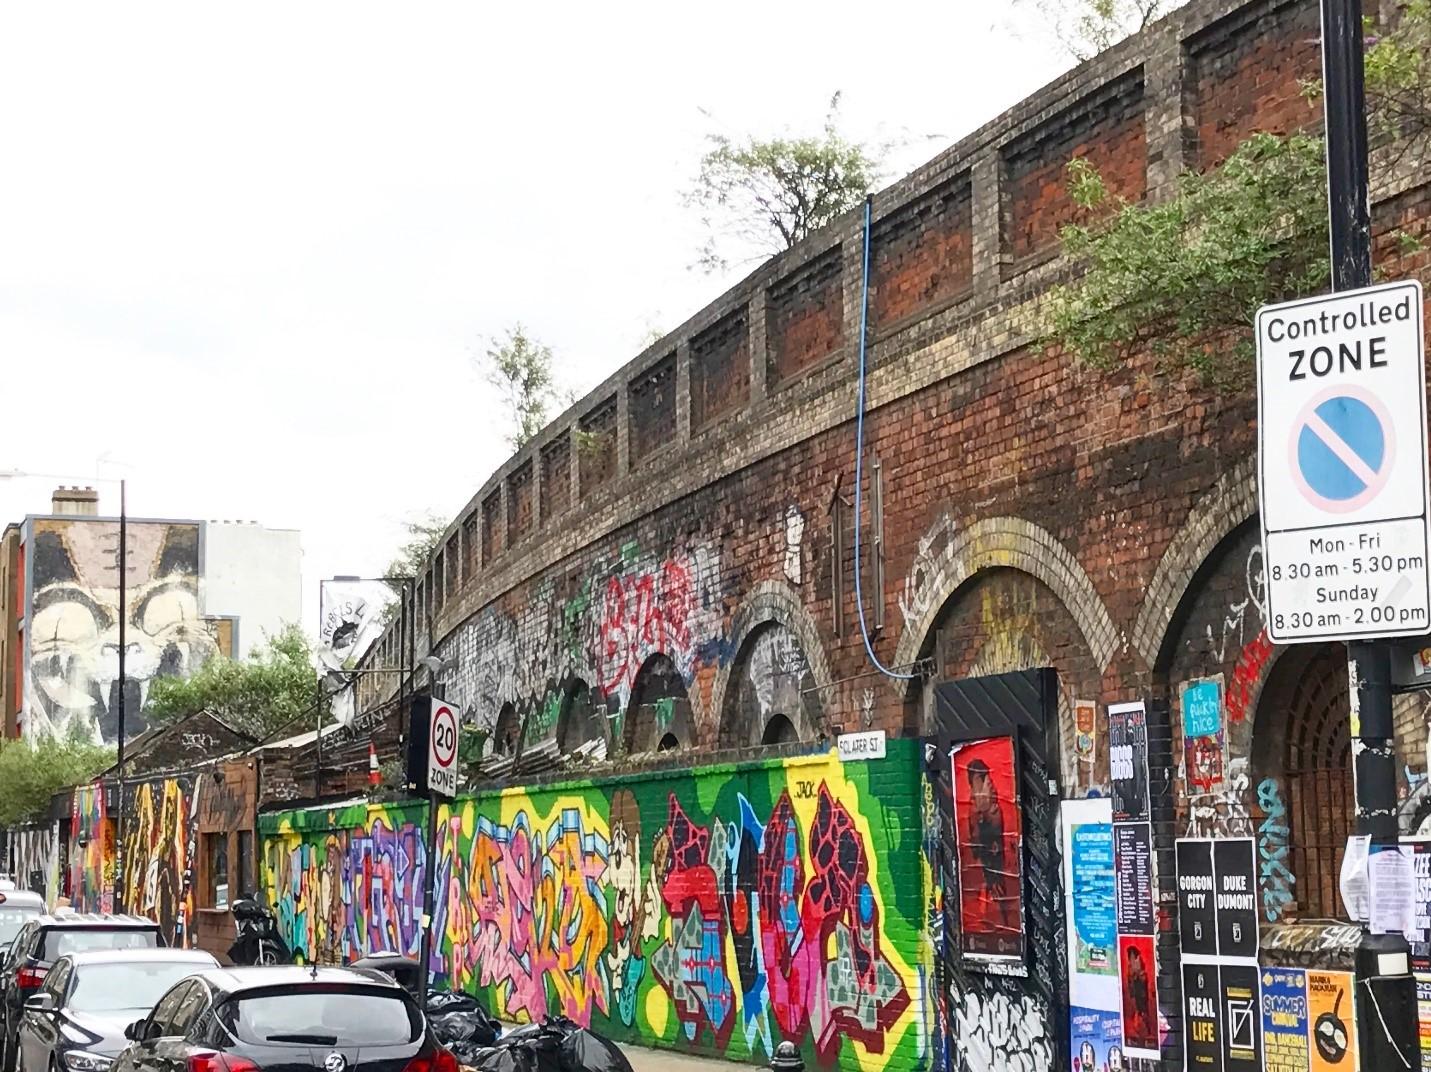 CAPAStudyAbroad_London_Summer2017_From Seth Neu Street Art 2.jpg